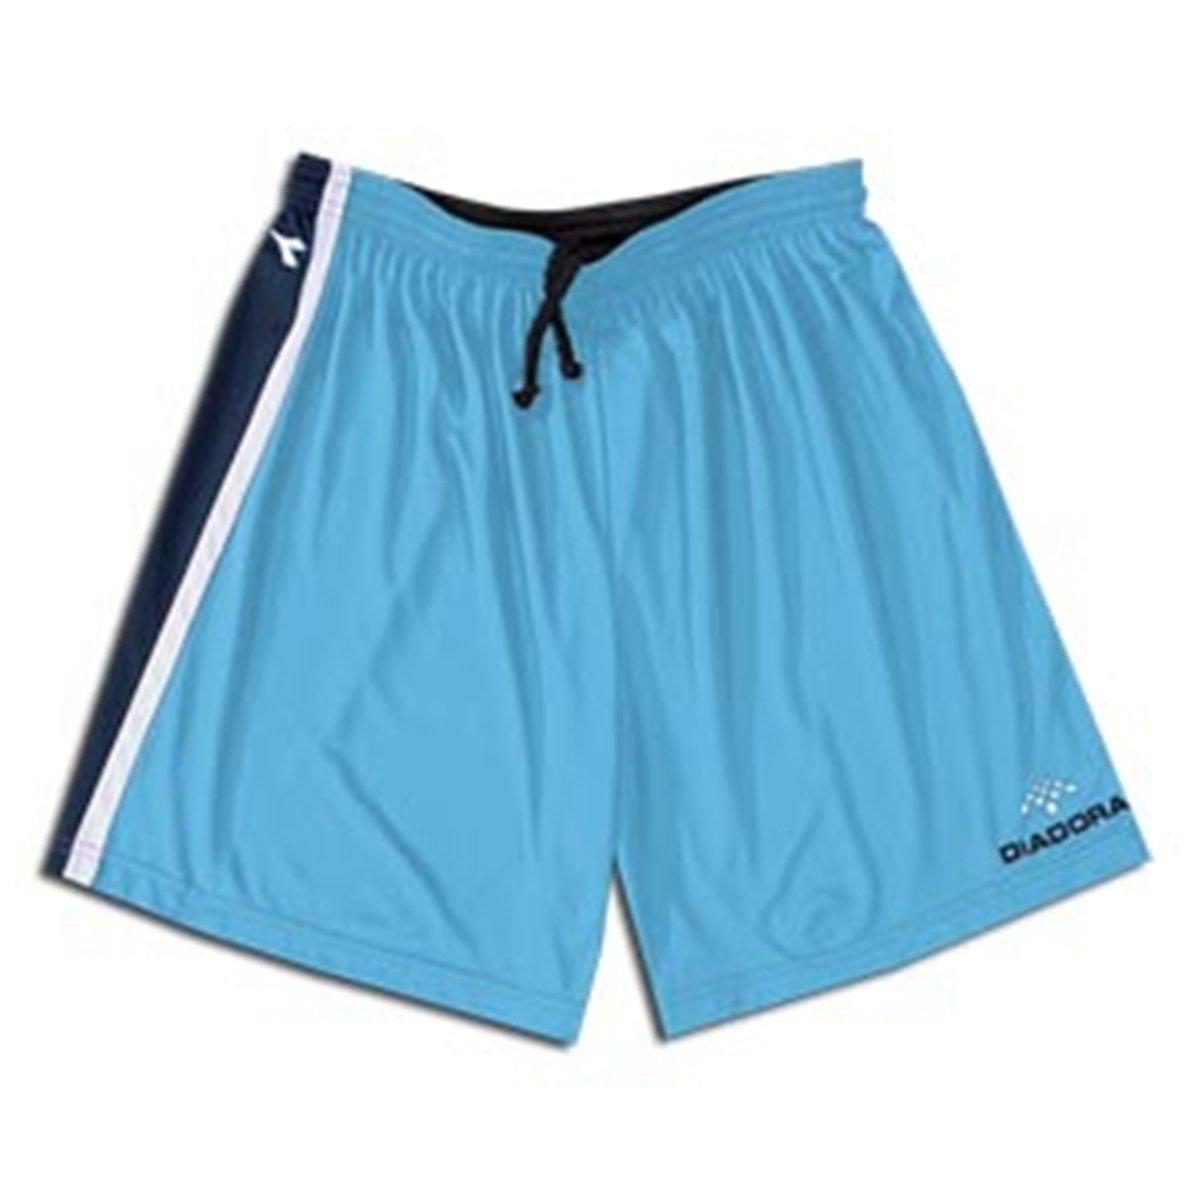 Diadora Serie A Soccer Shorts ( SN ) B003WYG5JQ221.Col/Navy AM